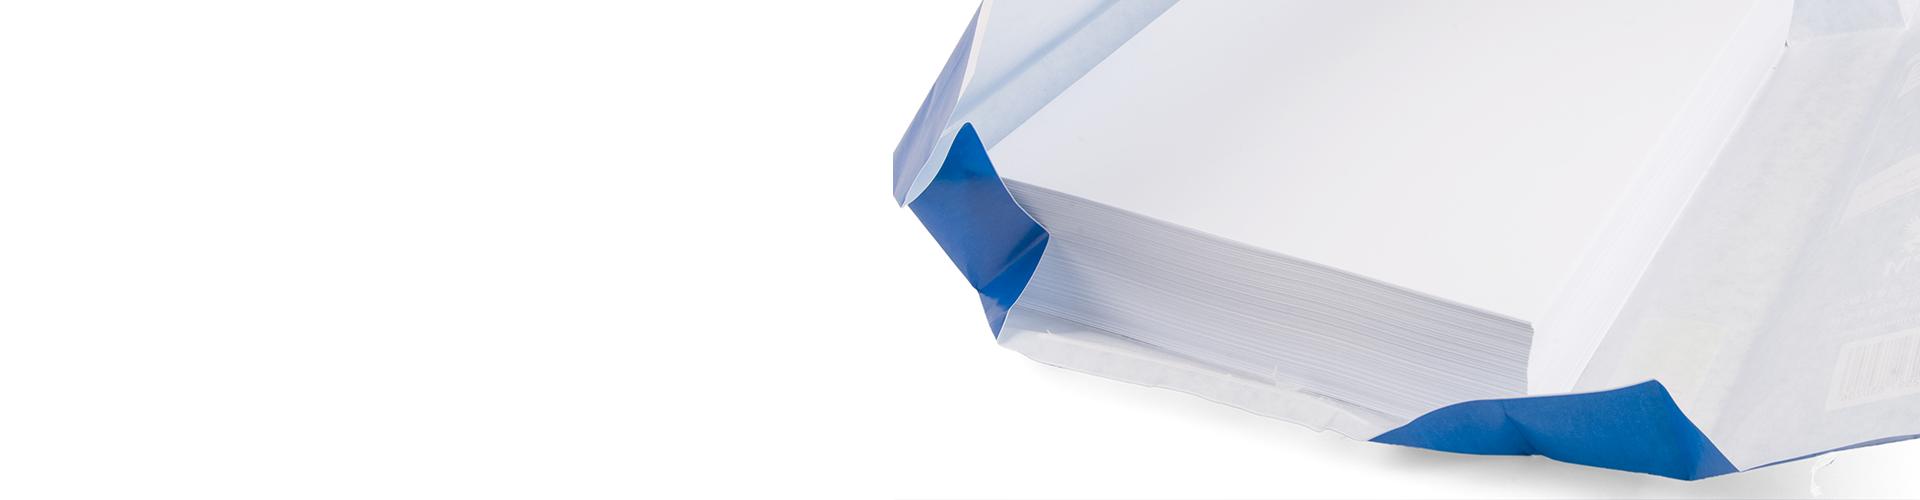 Cut Size Paper